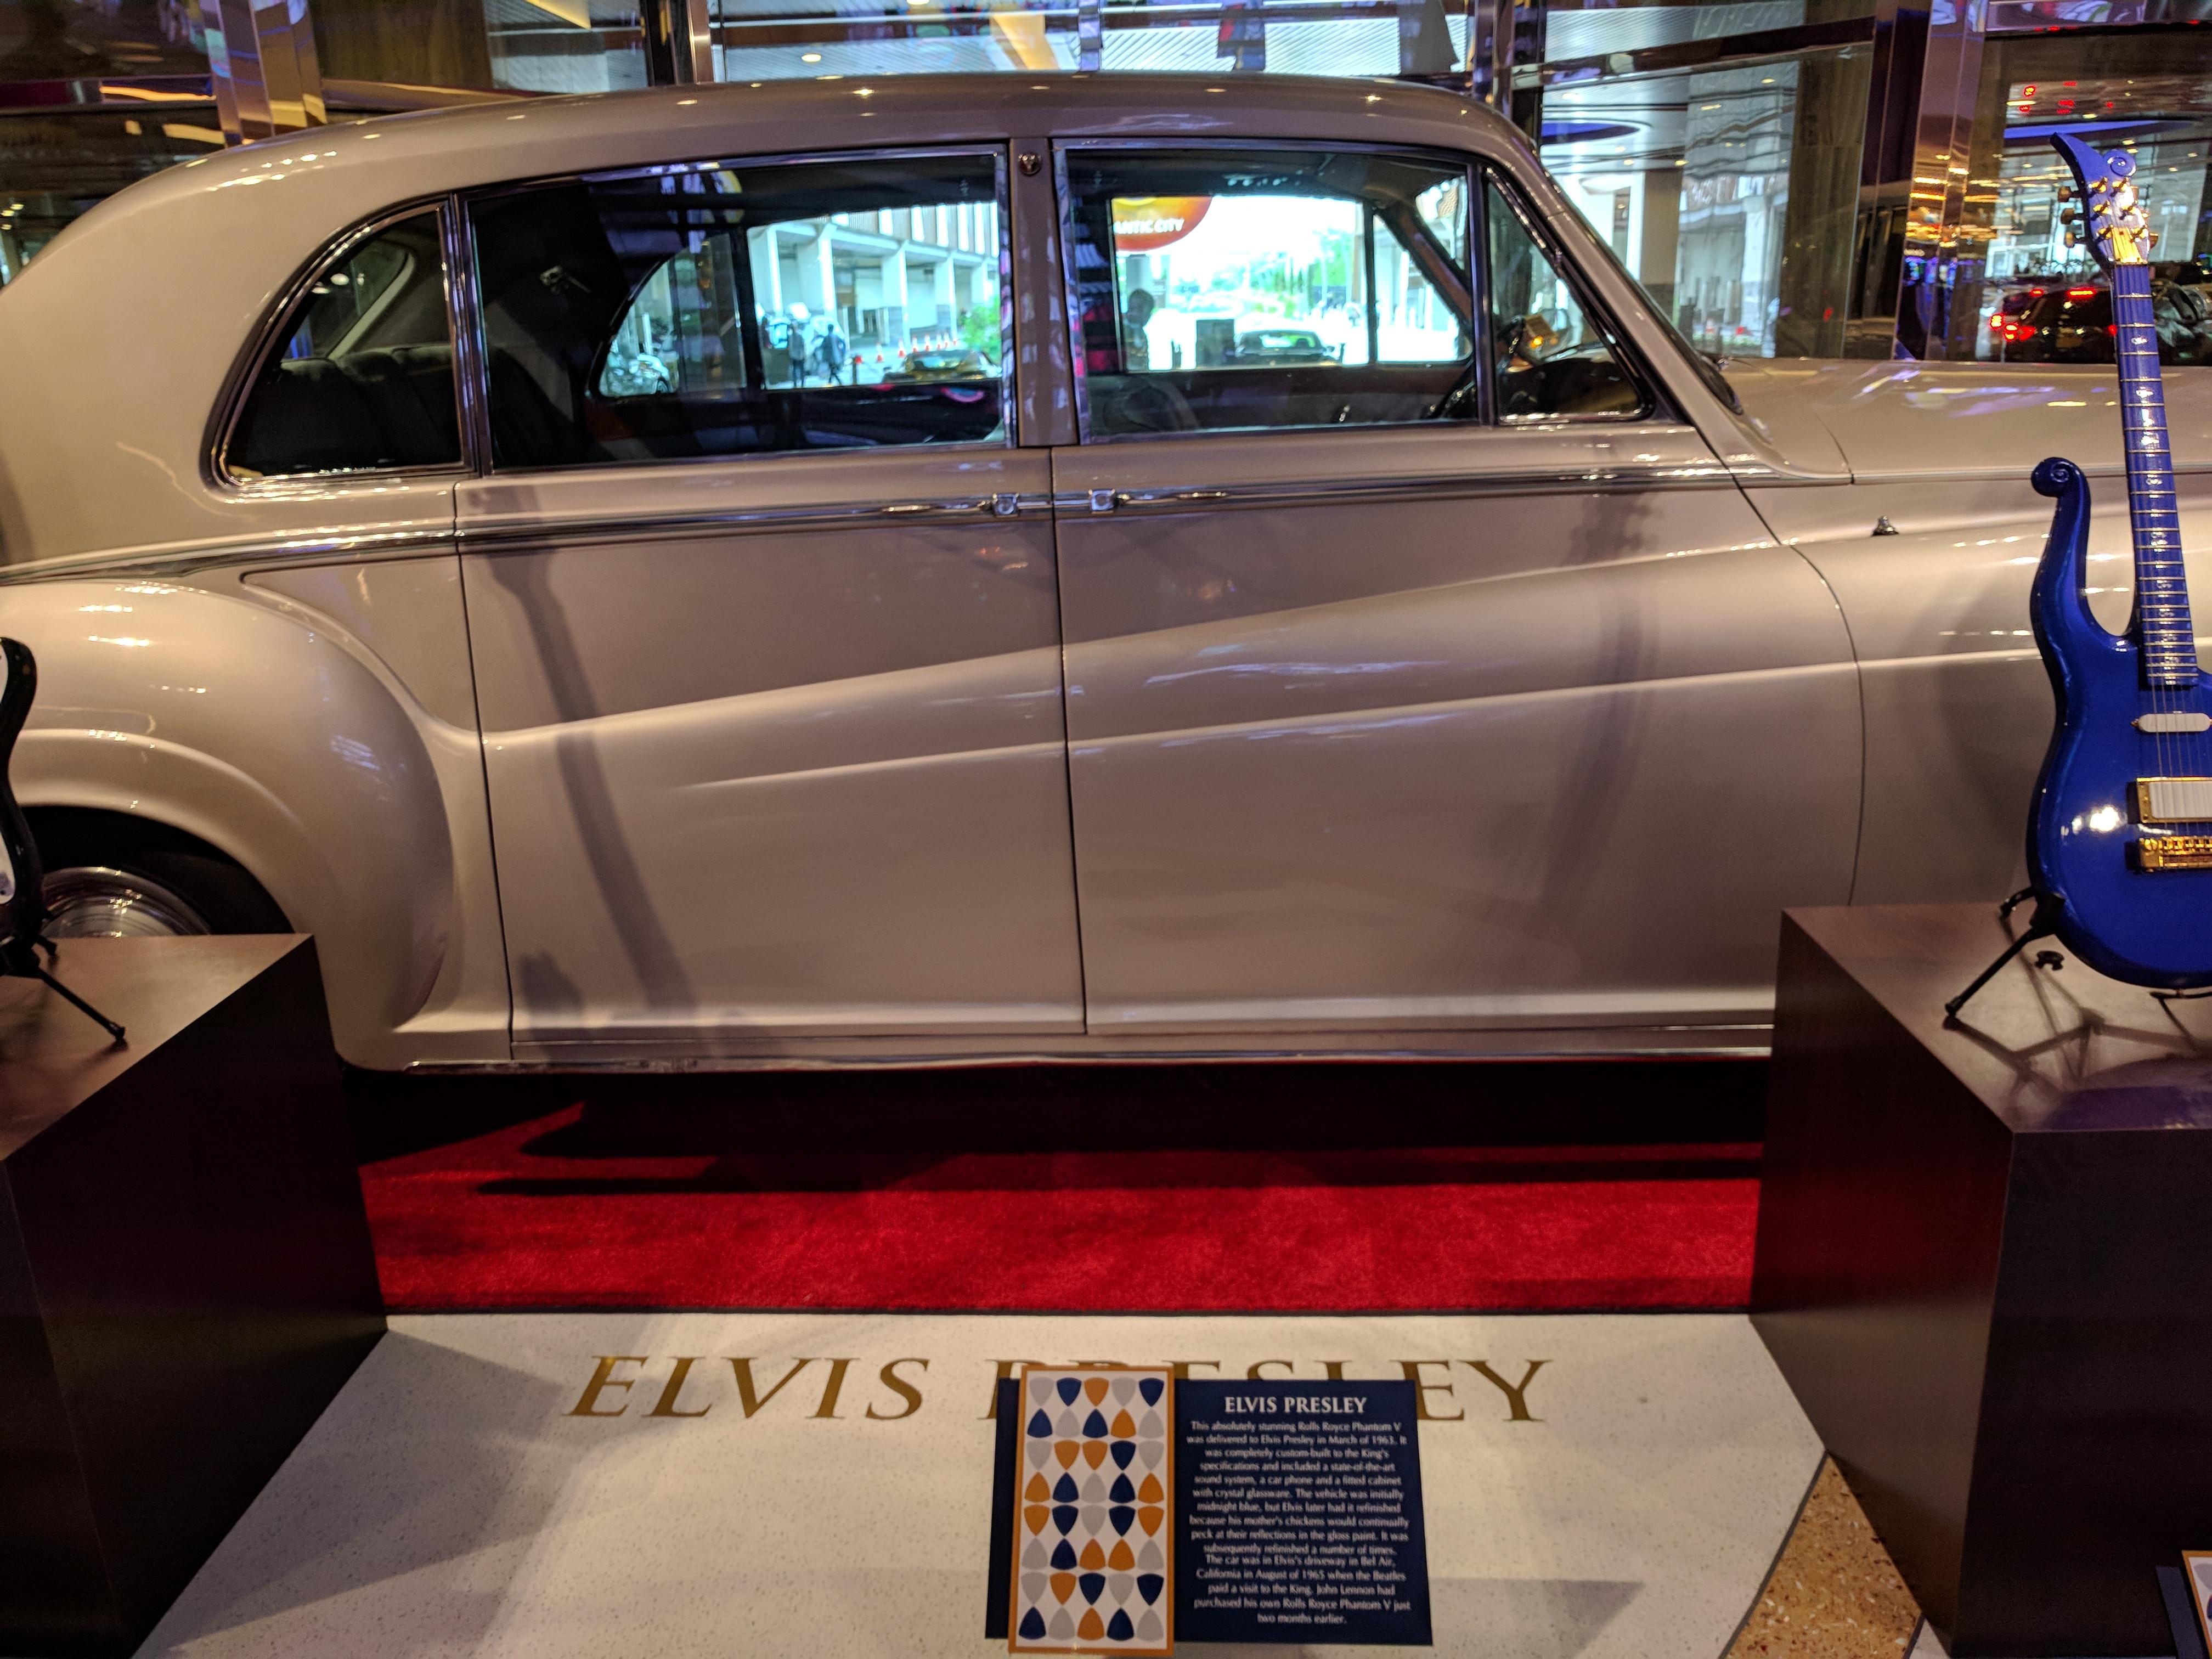 Elvis Presley Rolls Royce Phantom V